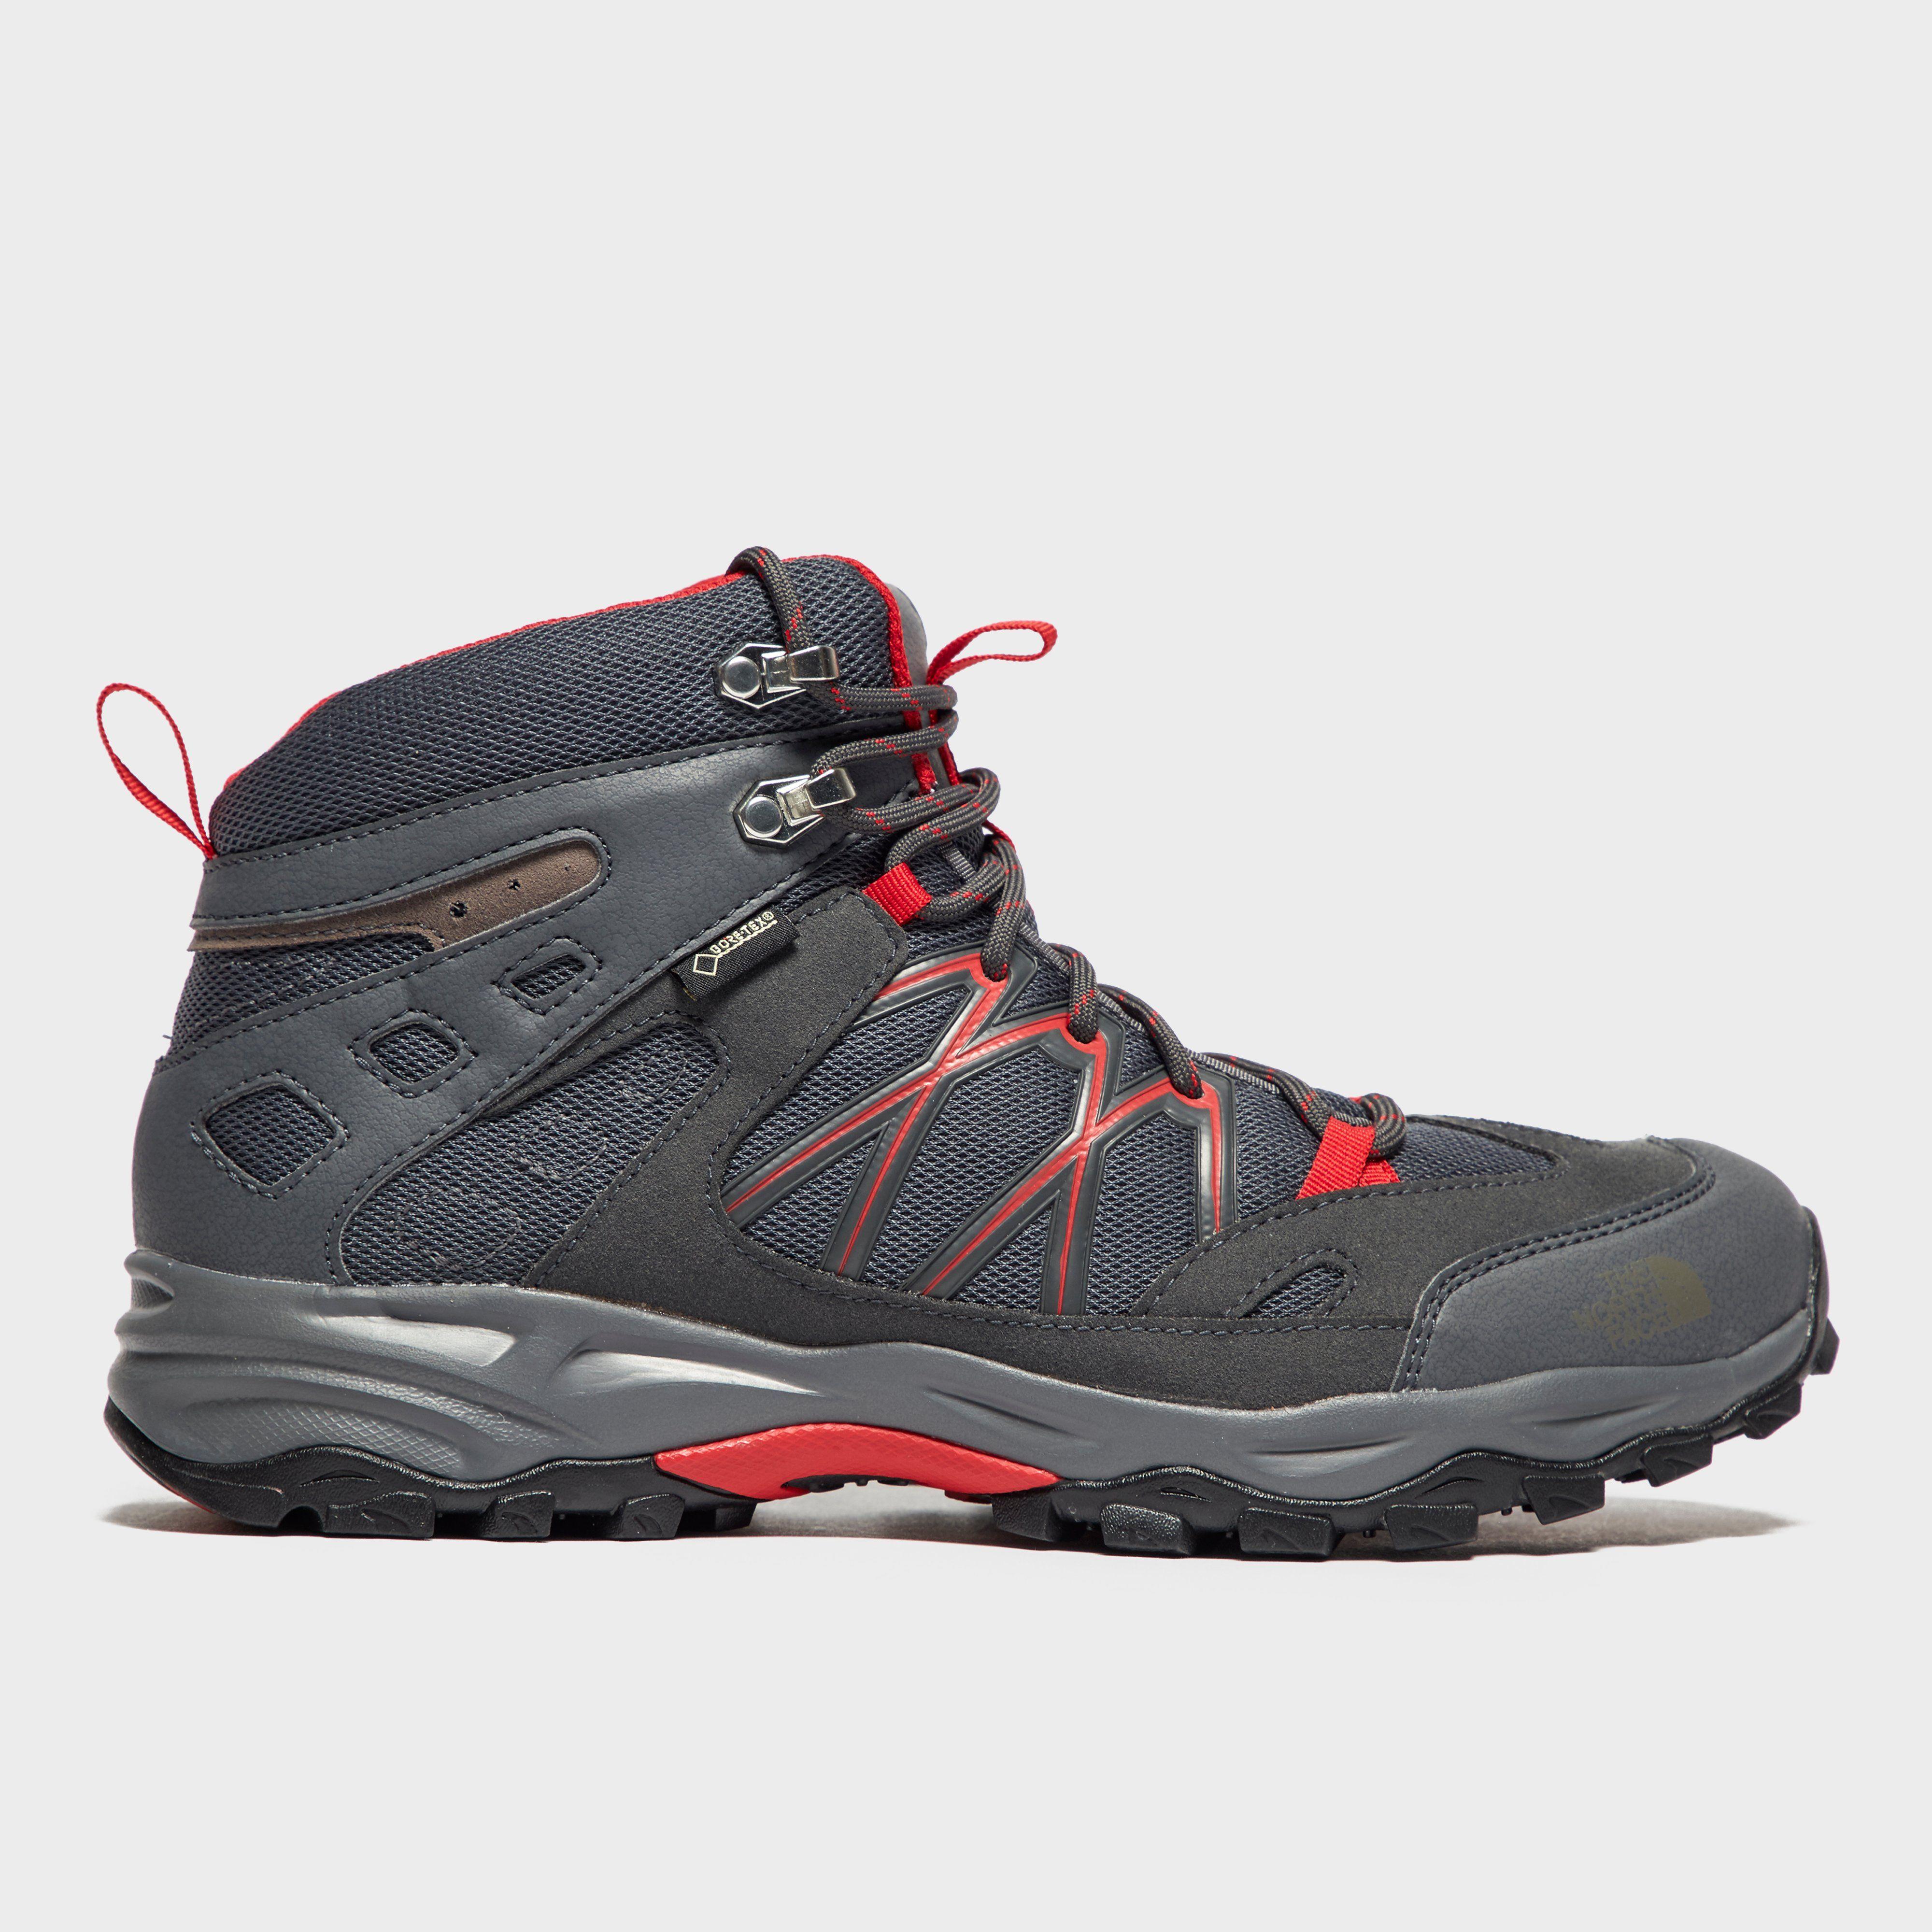 THE NORTH FACE Men's Terra Mid GORE-TEX® Walking Boot